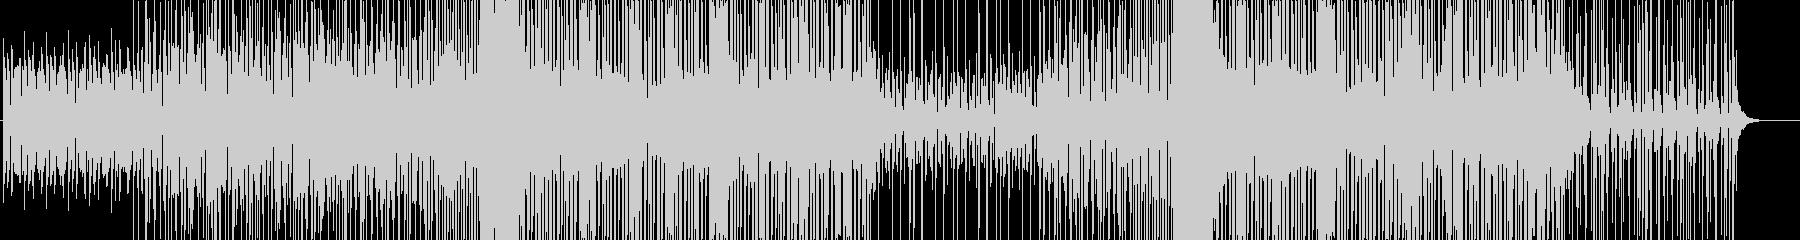 EDM-クール-TikTok-PV-動画の未再生の波形